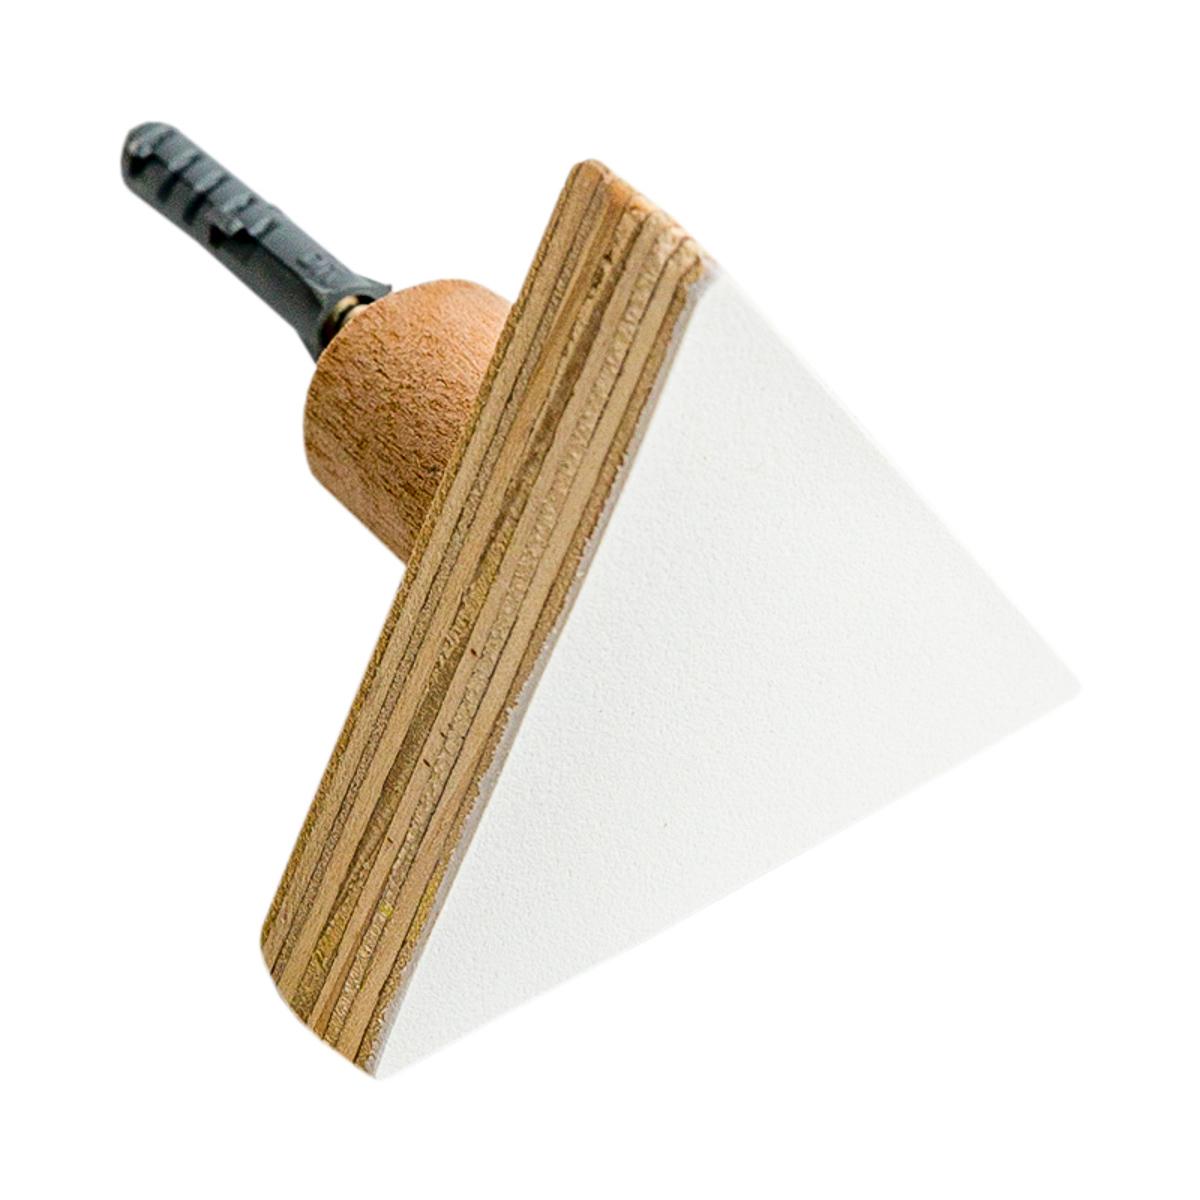 Gancho de Parede Triângulo Branco e Madeira